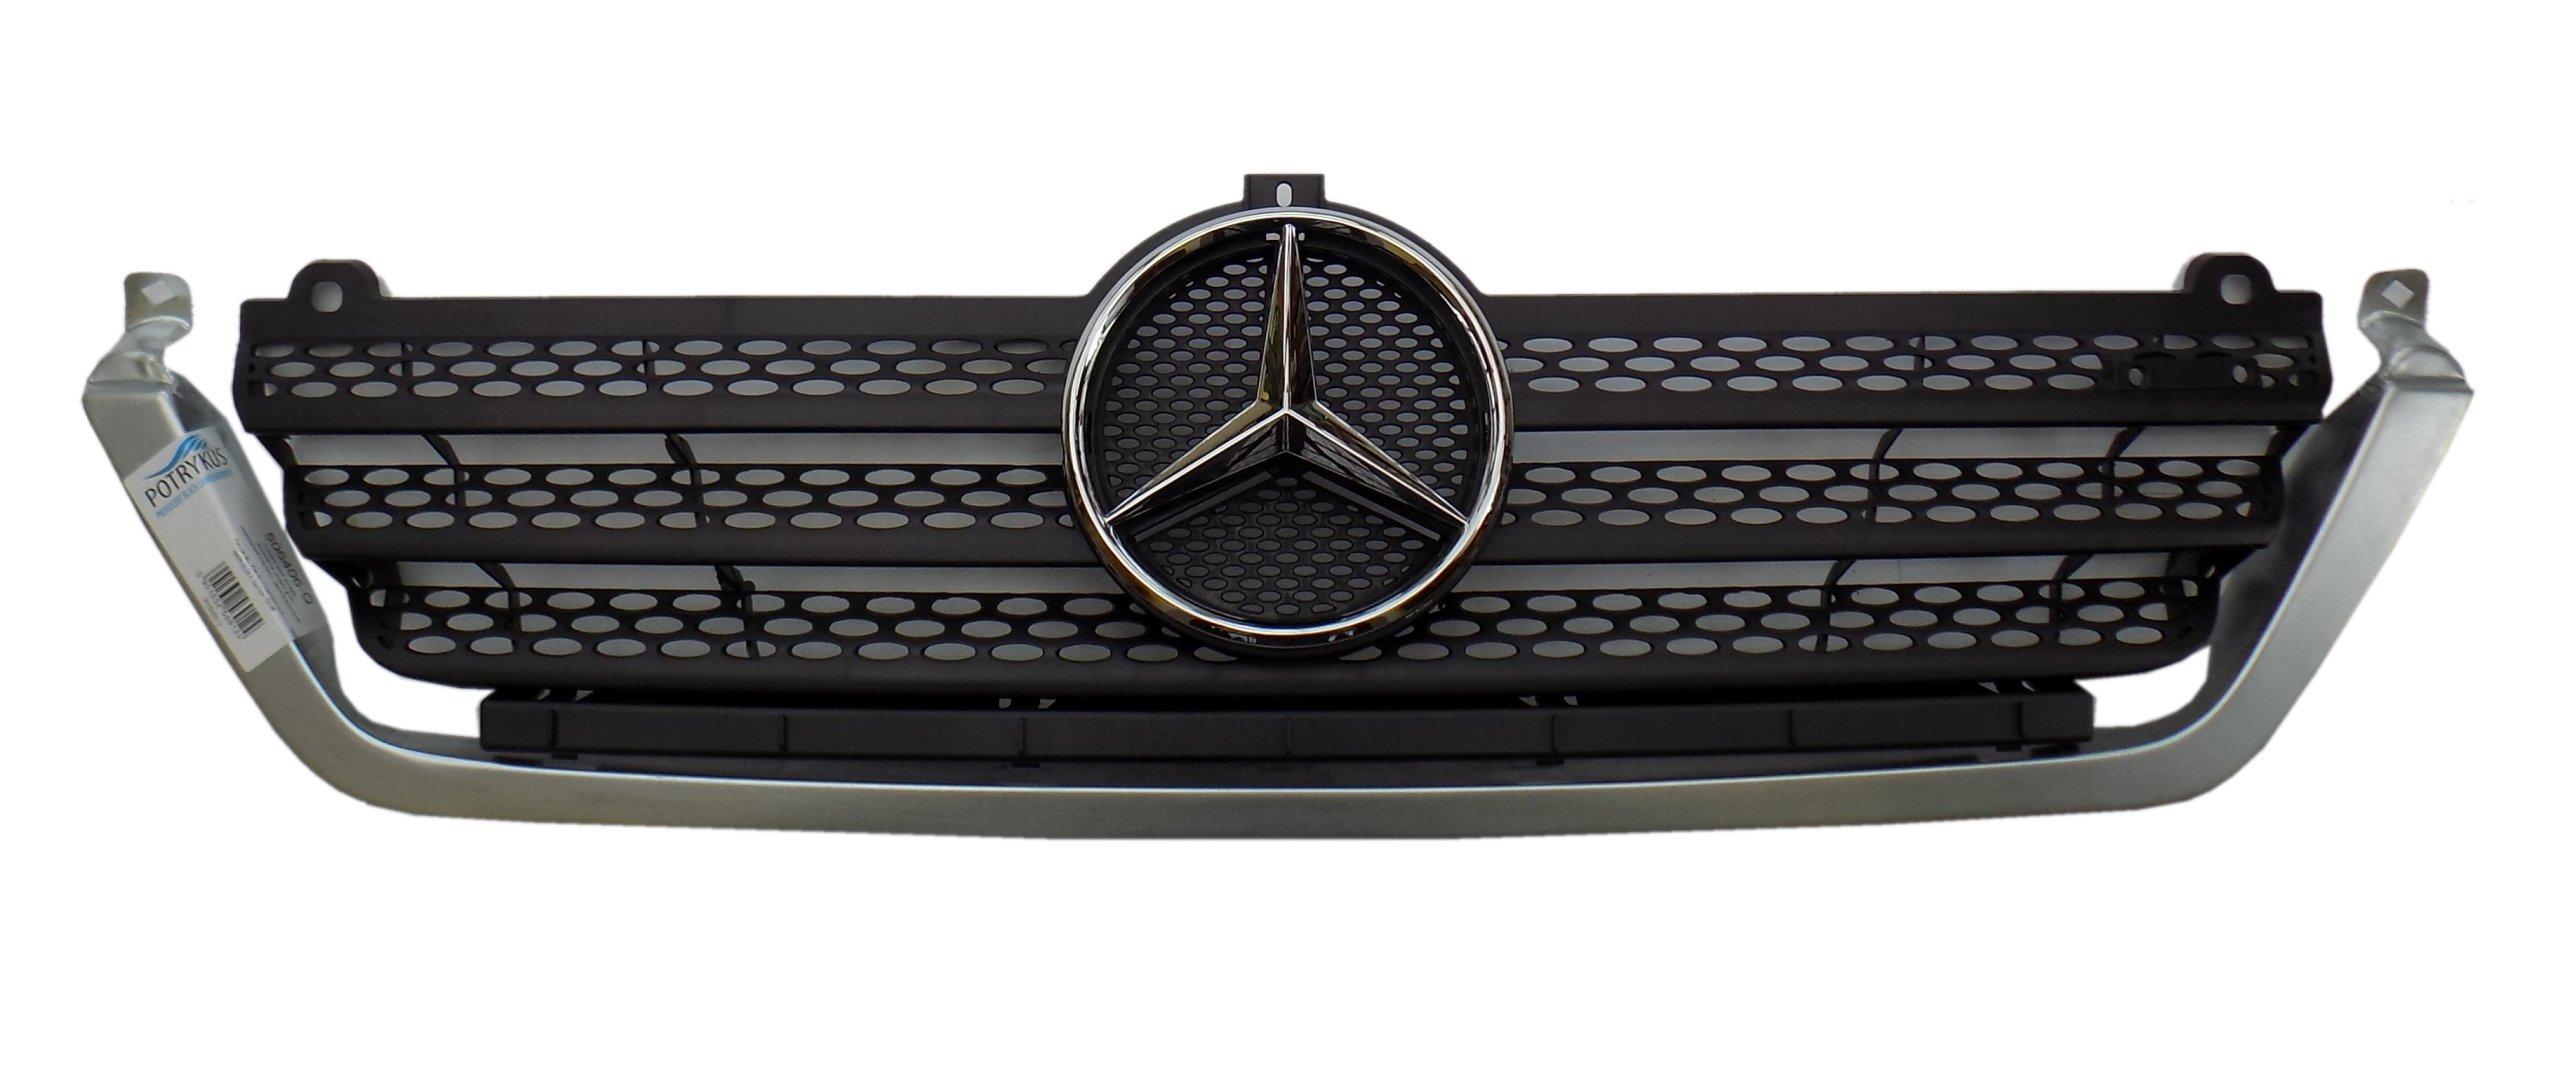 mercedes sprinter 03- cdi решетка гриль планка логотип